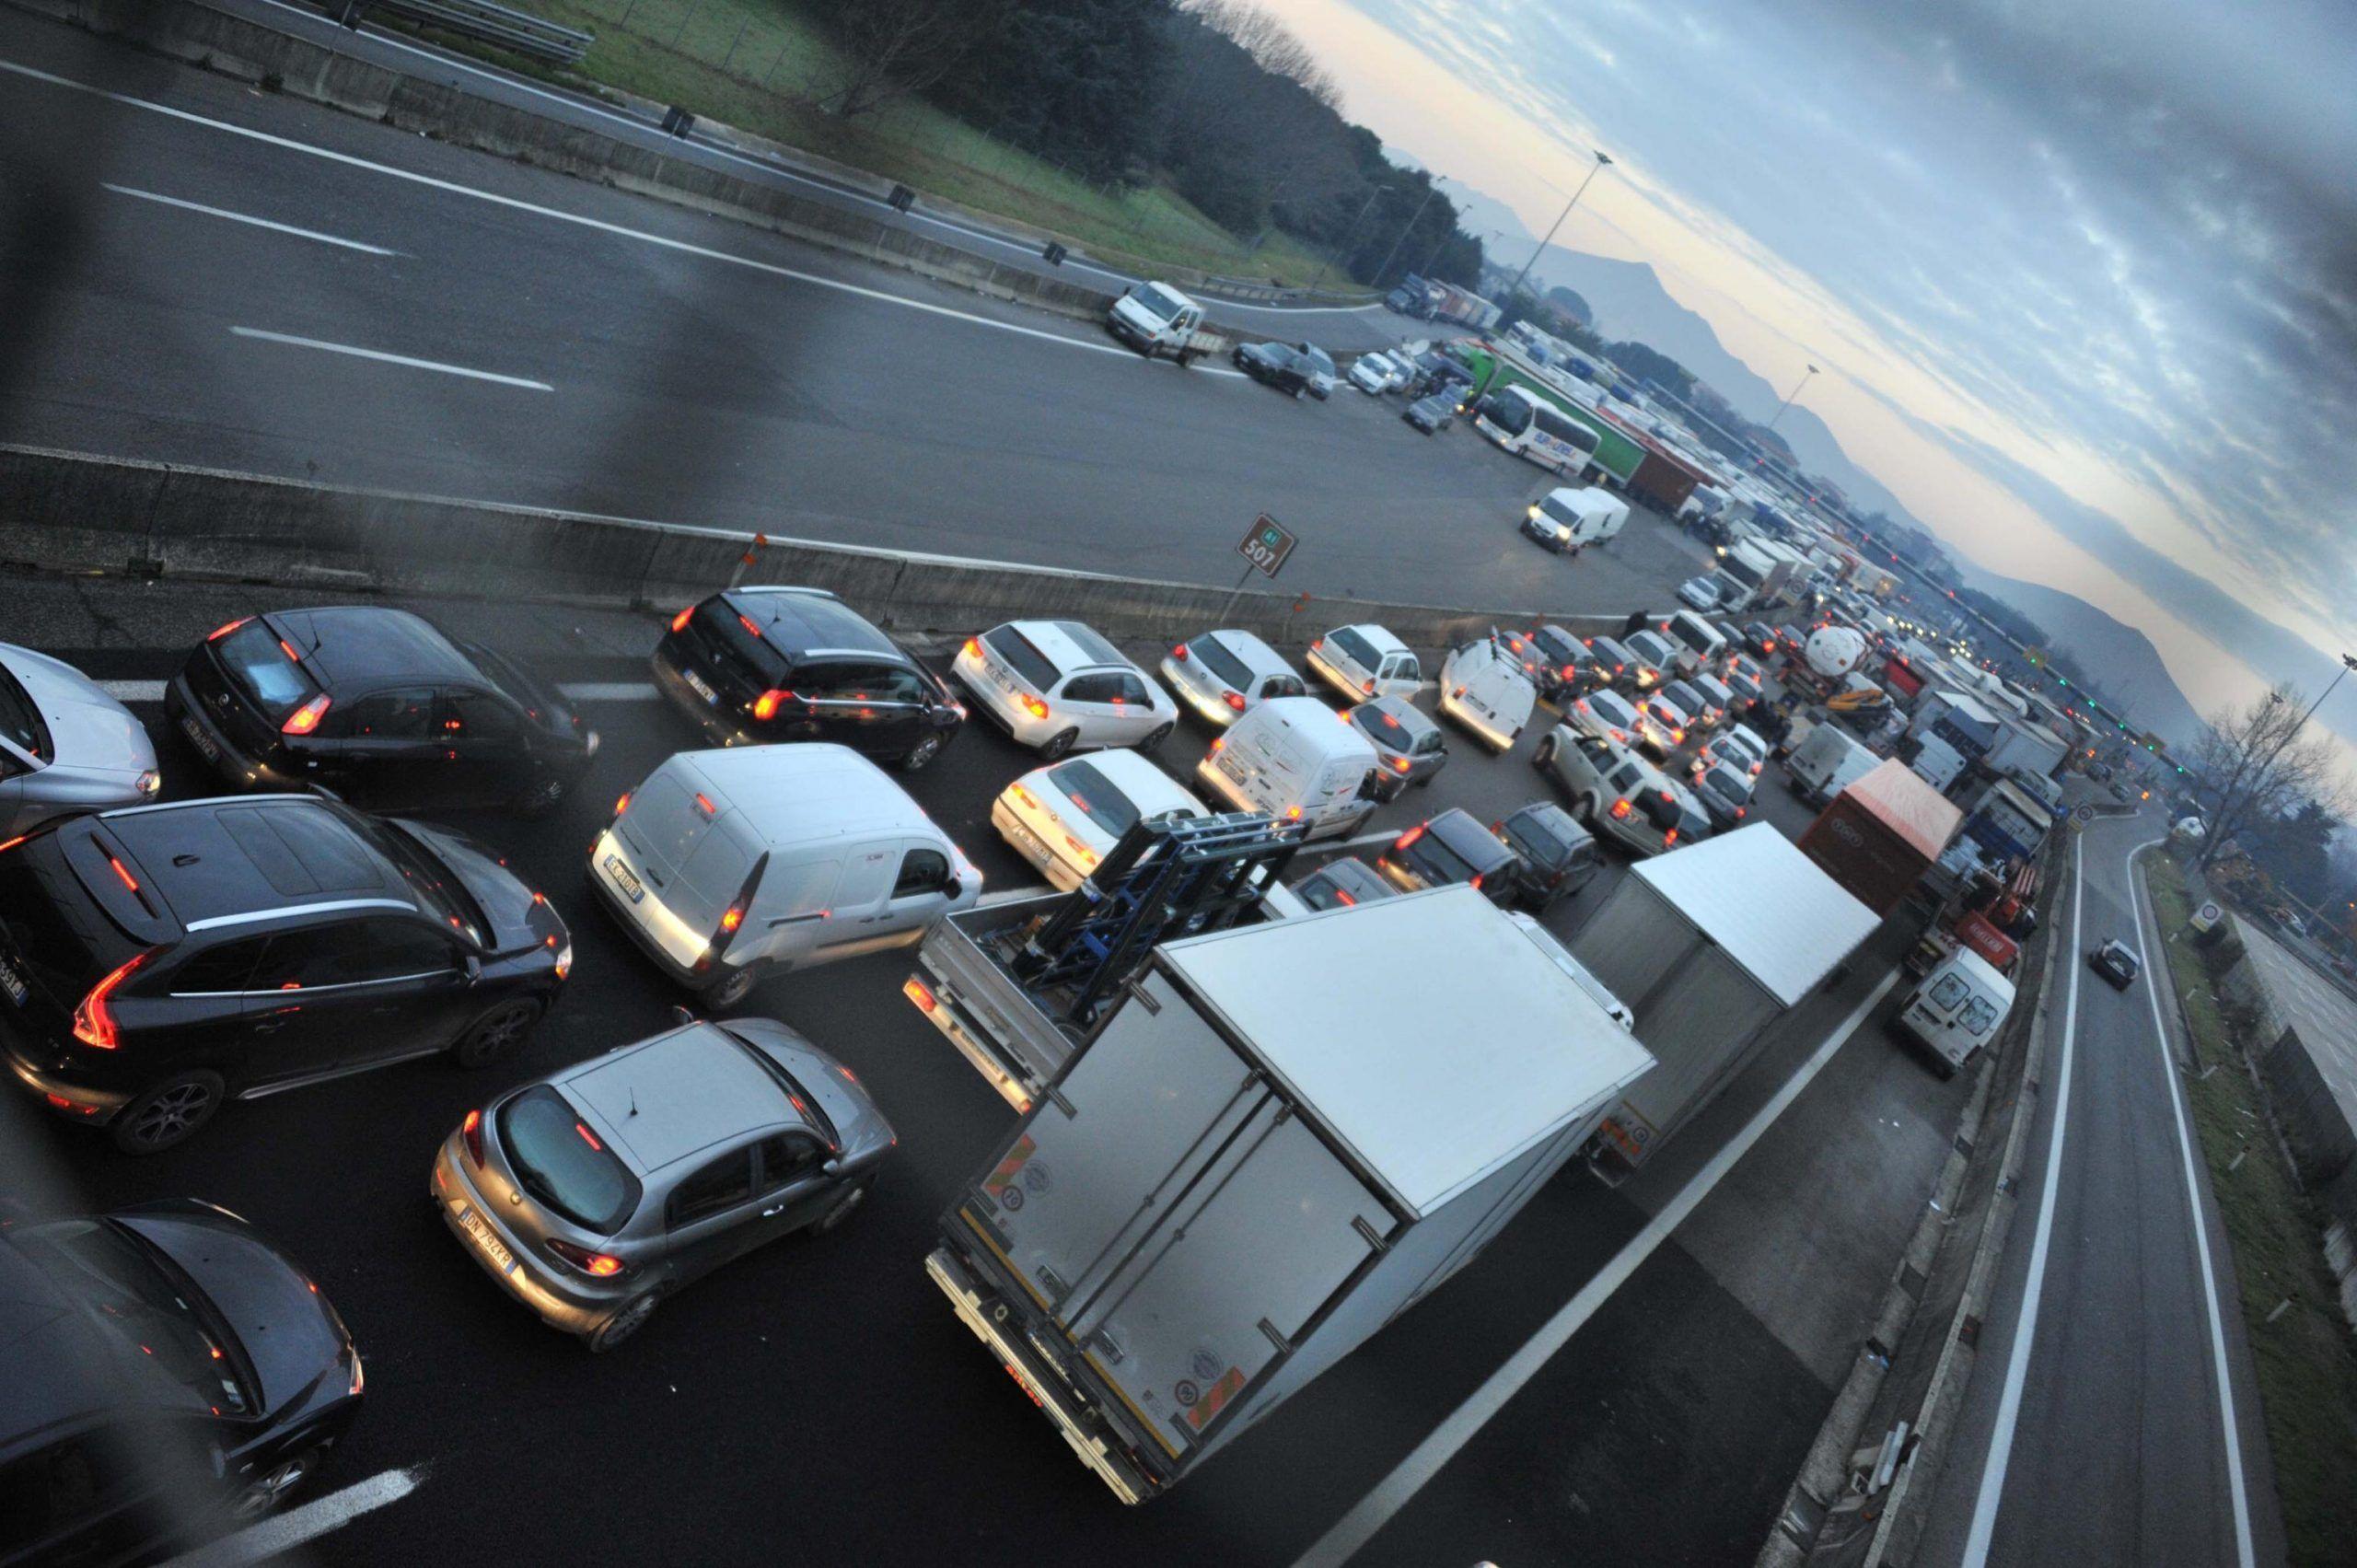 Pedaggi autostradali: chi ci guadagna dai continui rincari?